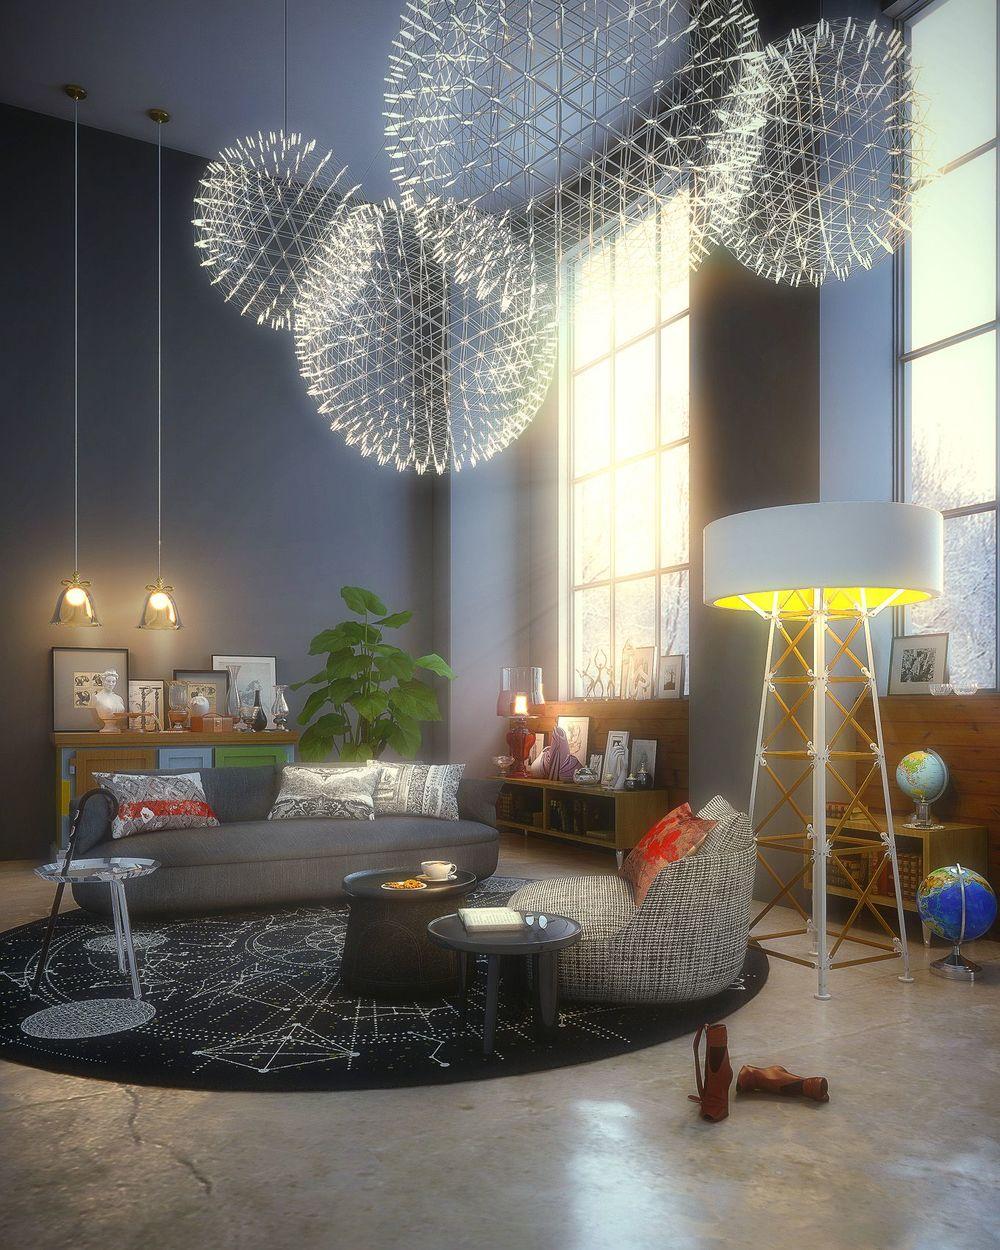 interior-rendering-01b-forweb-moooi_0.jpg